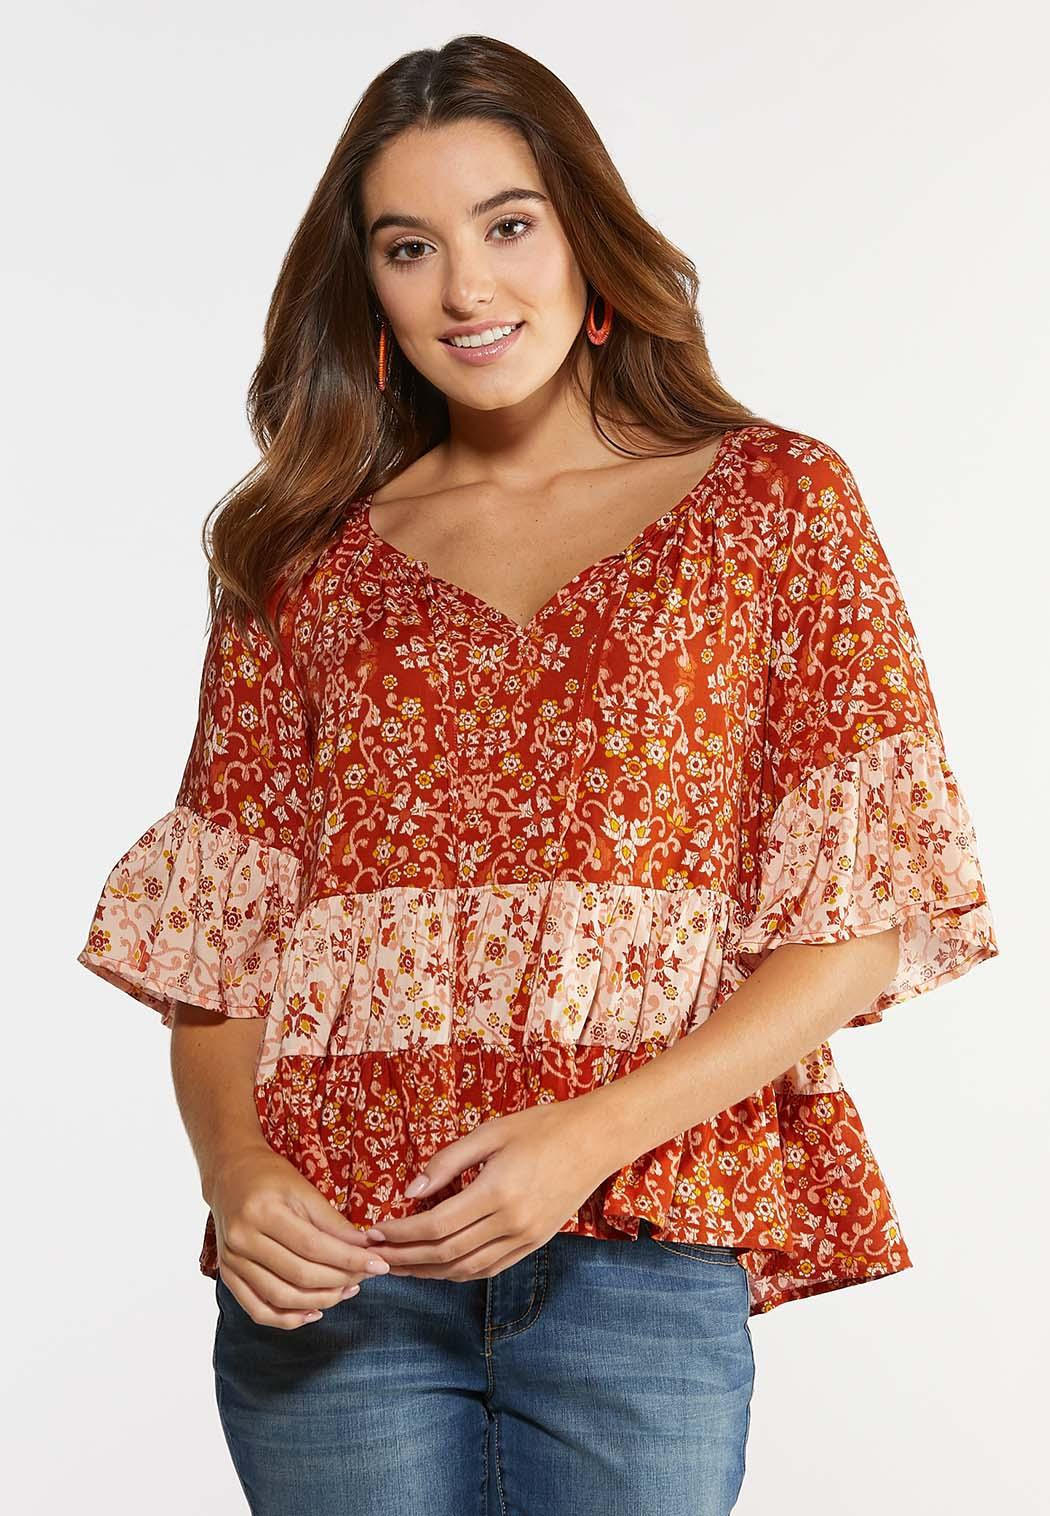 Orange Ruffled Floral Top